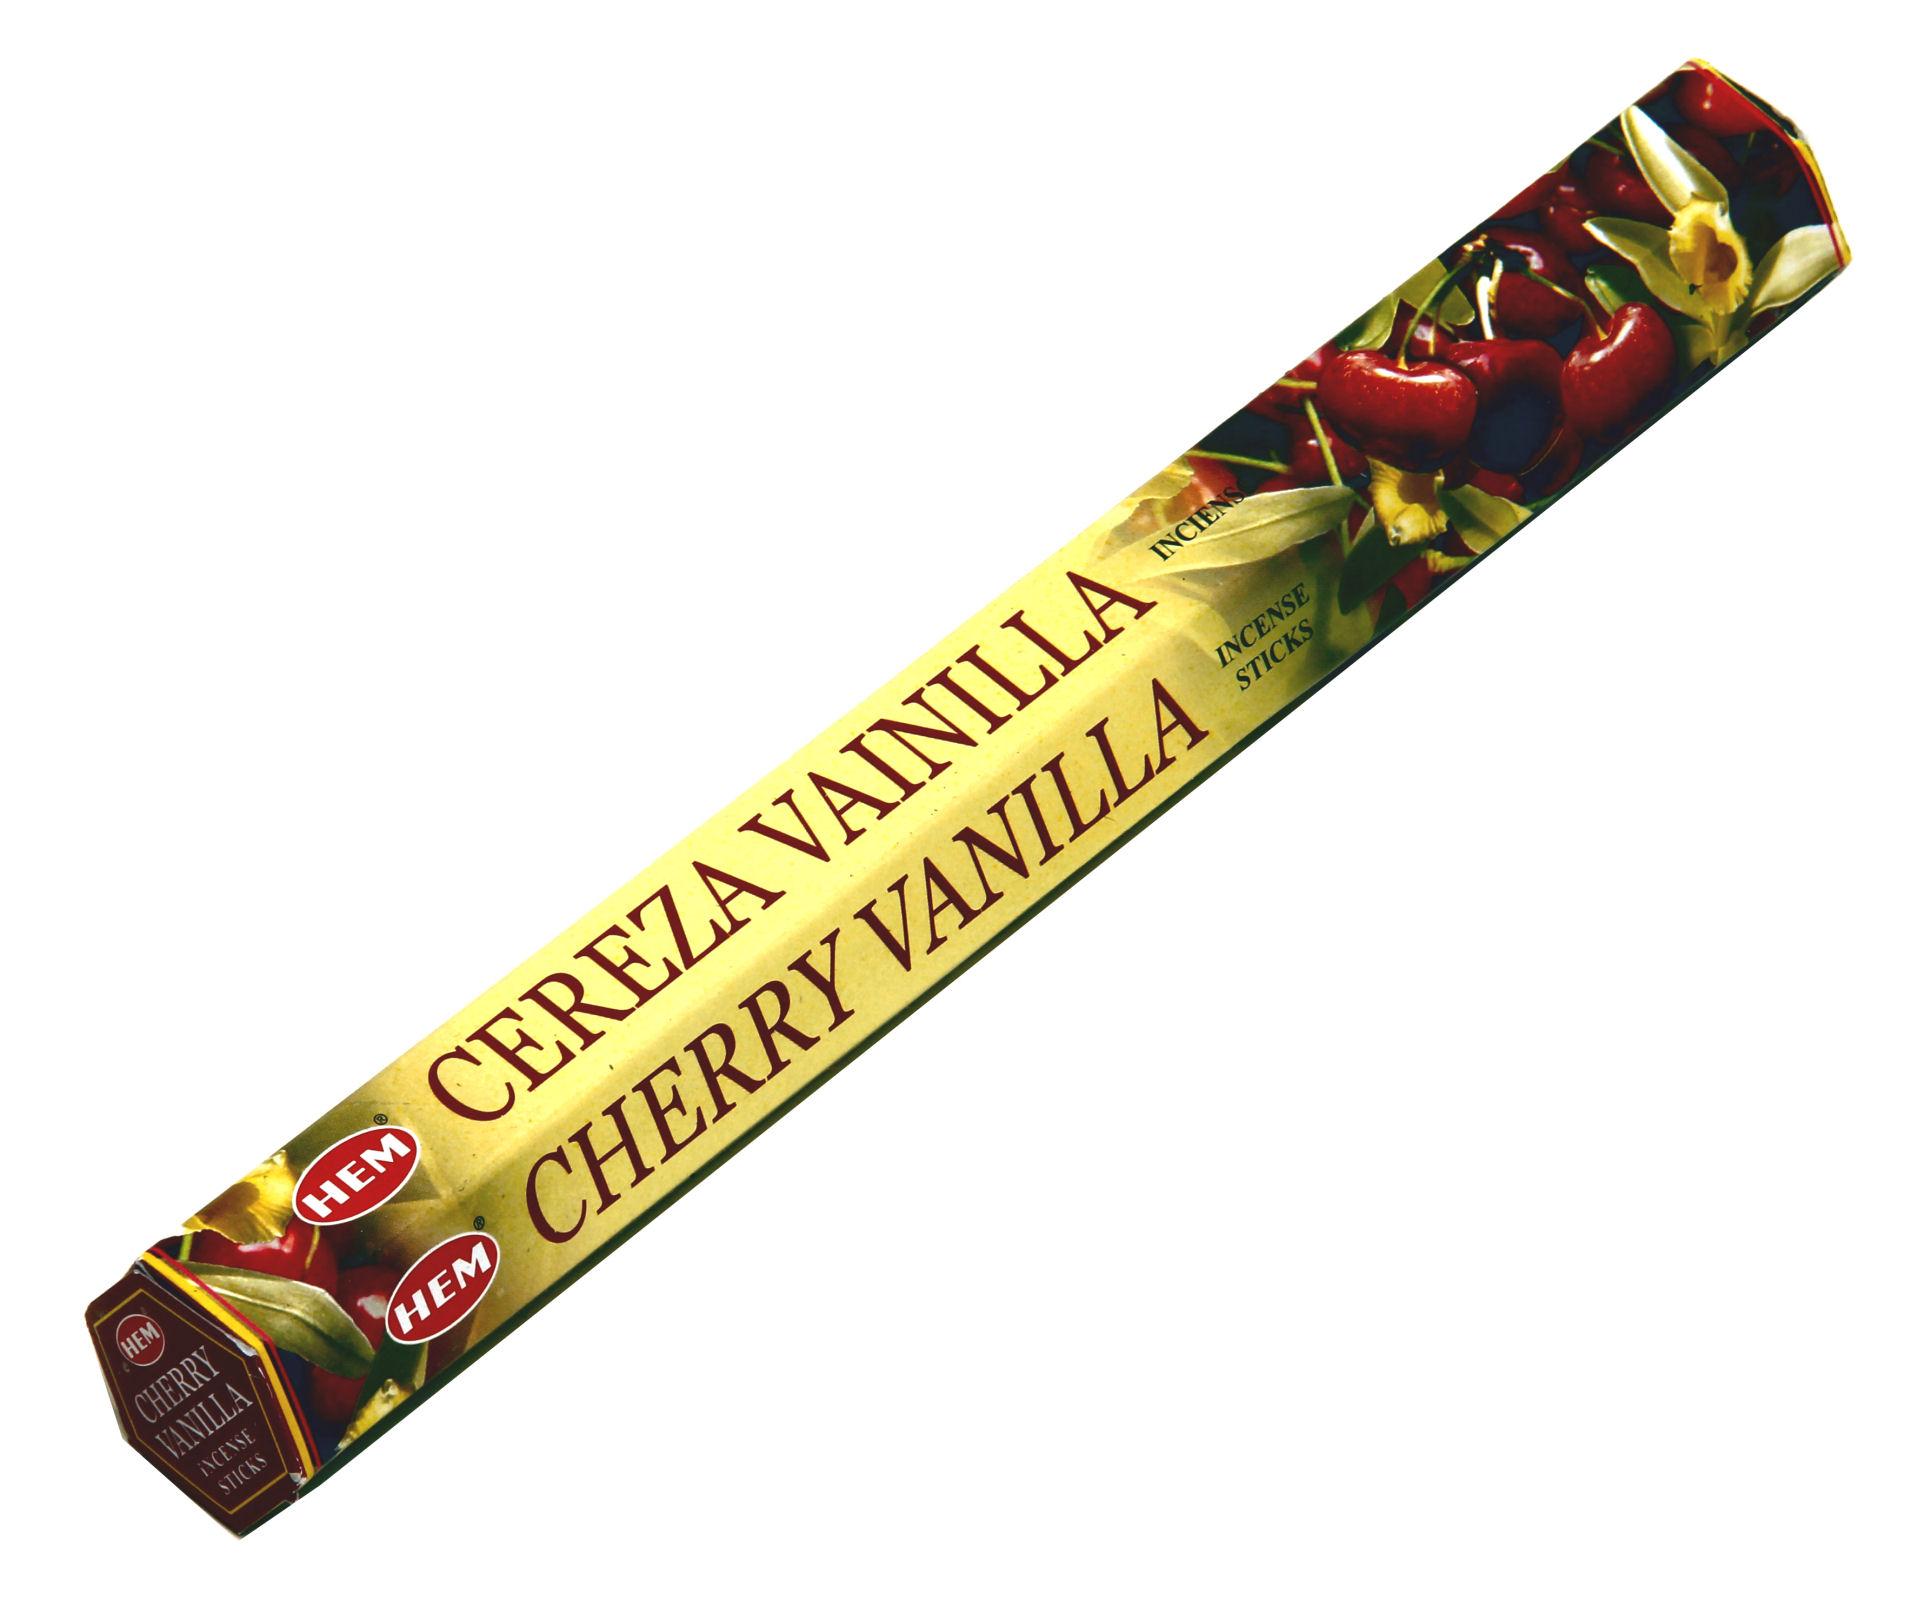 HEM Räucherstäbchen Cherry Vanilla 20g Hexa Packung  Ca. 20 Incence Sticks